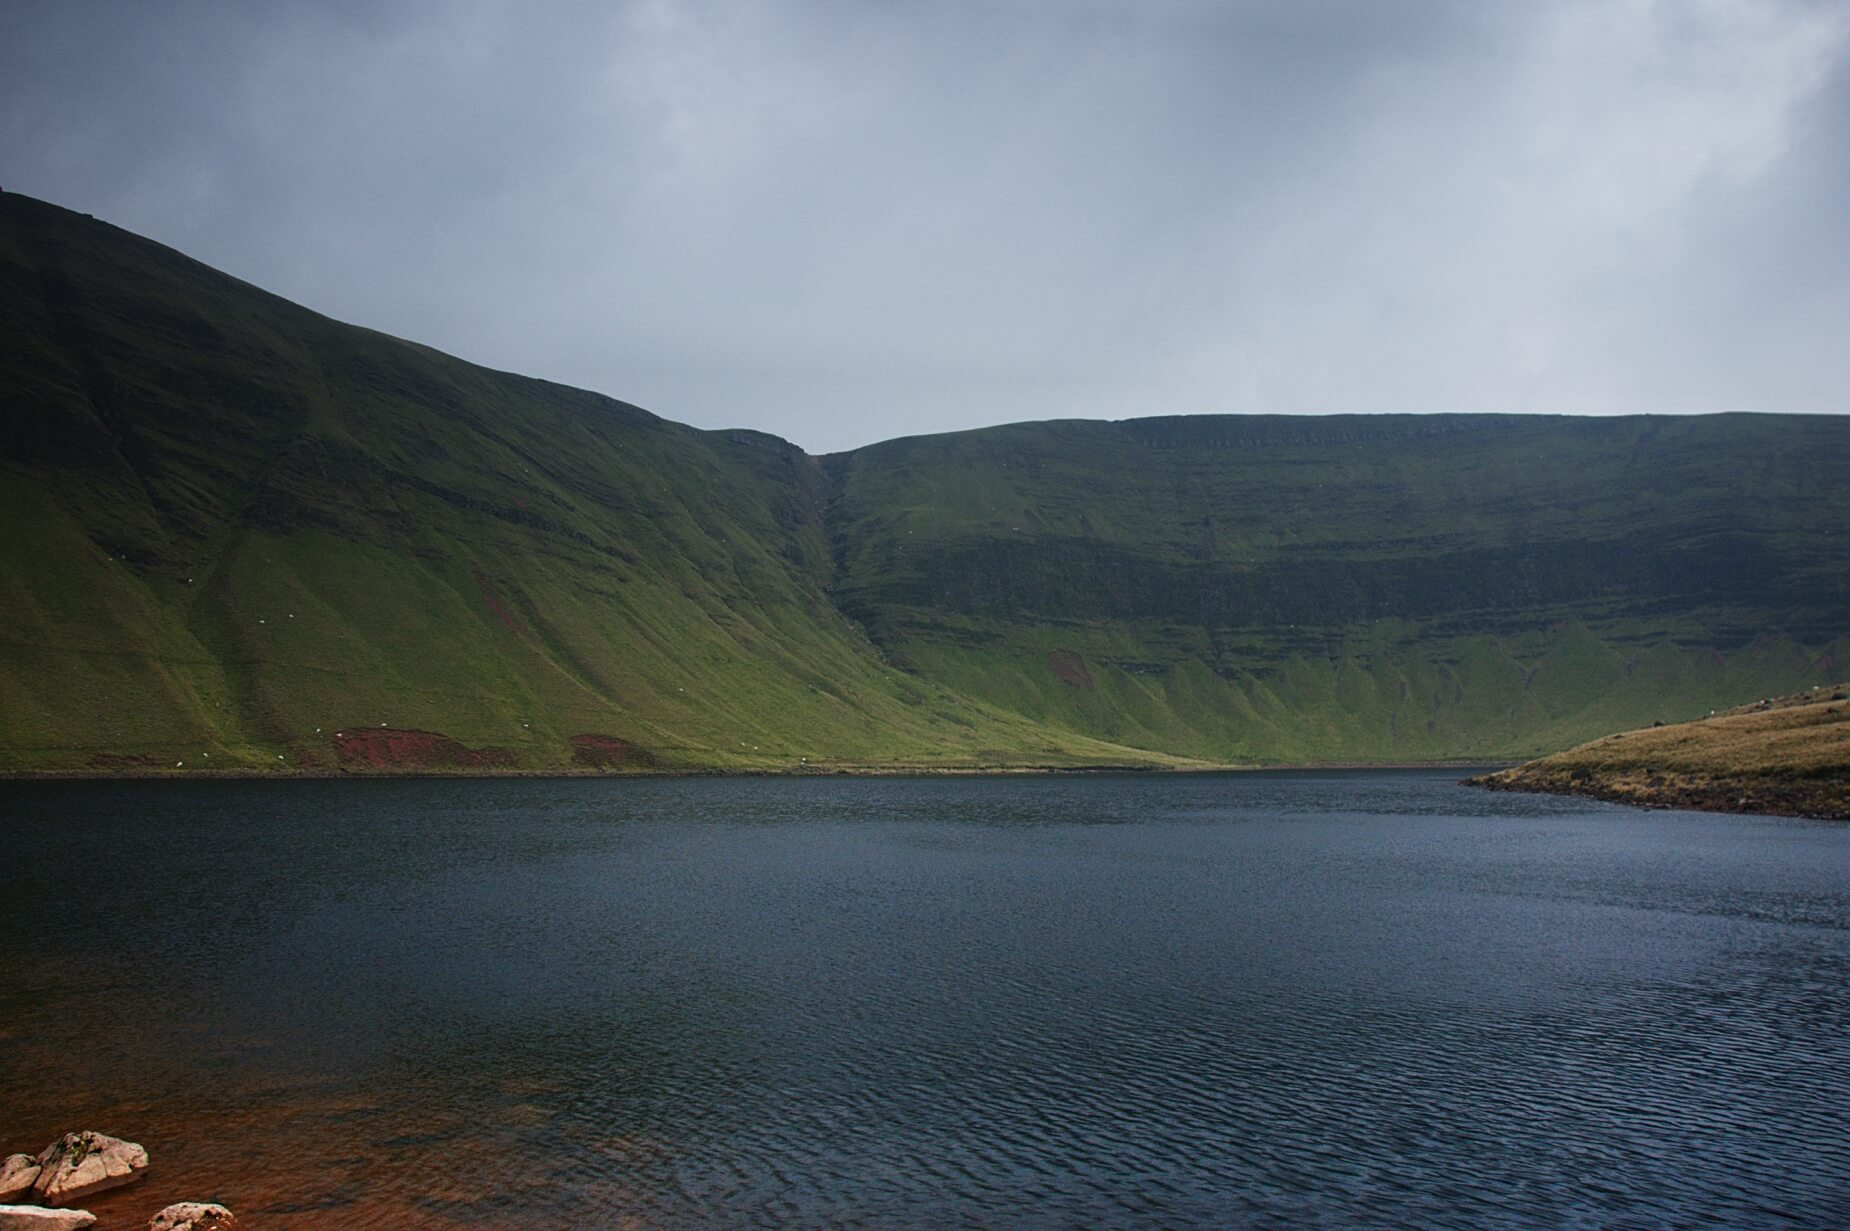 Llyn y Fan Fach, Brecon Beacons National Park